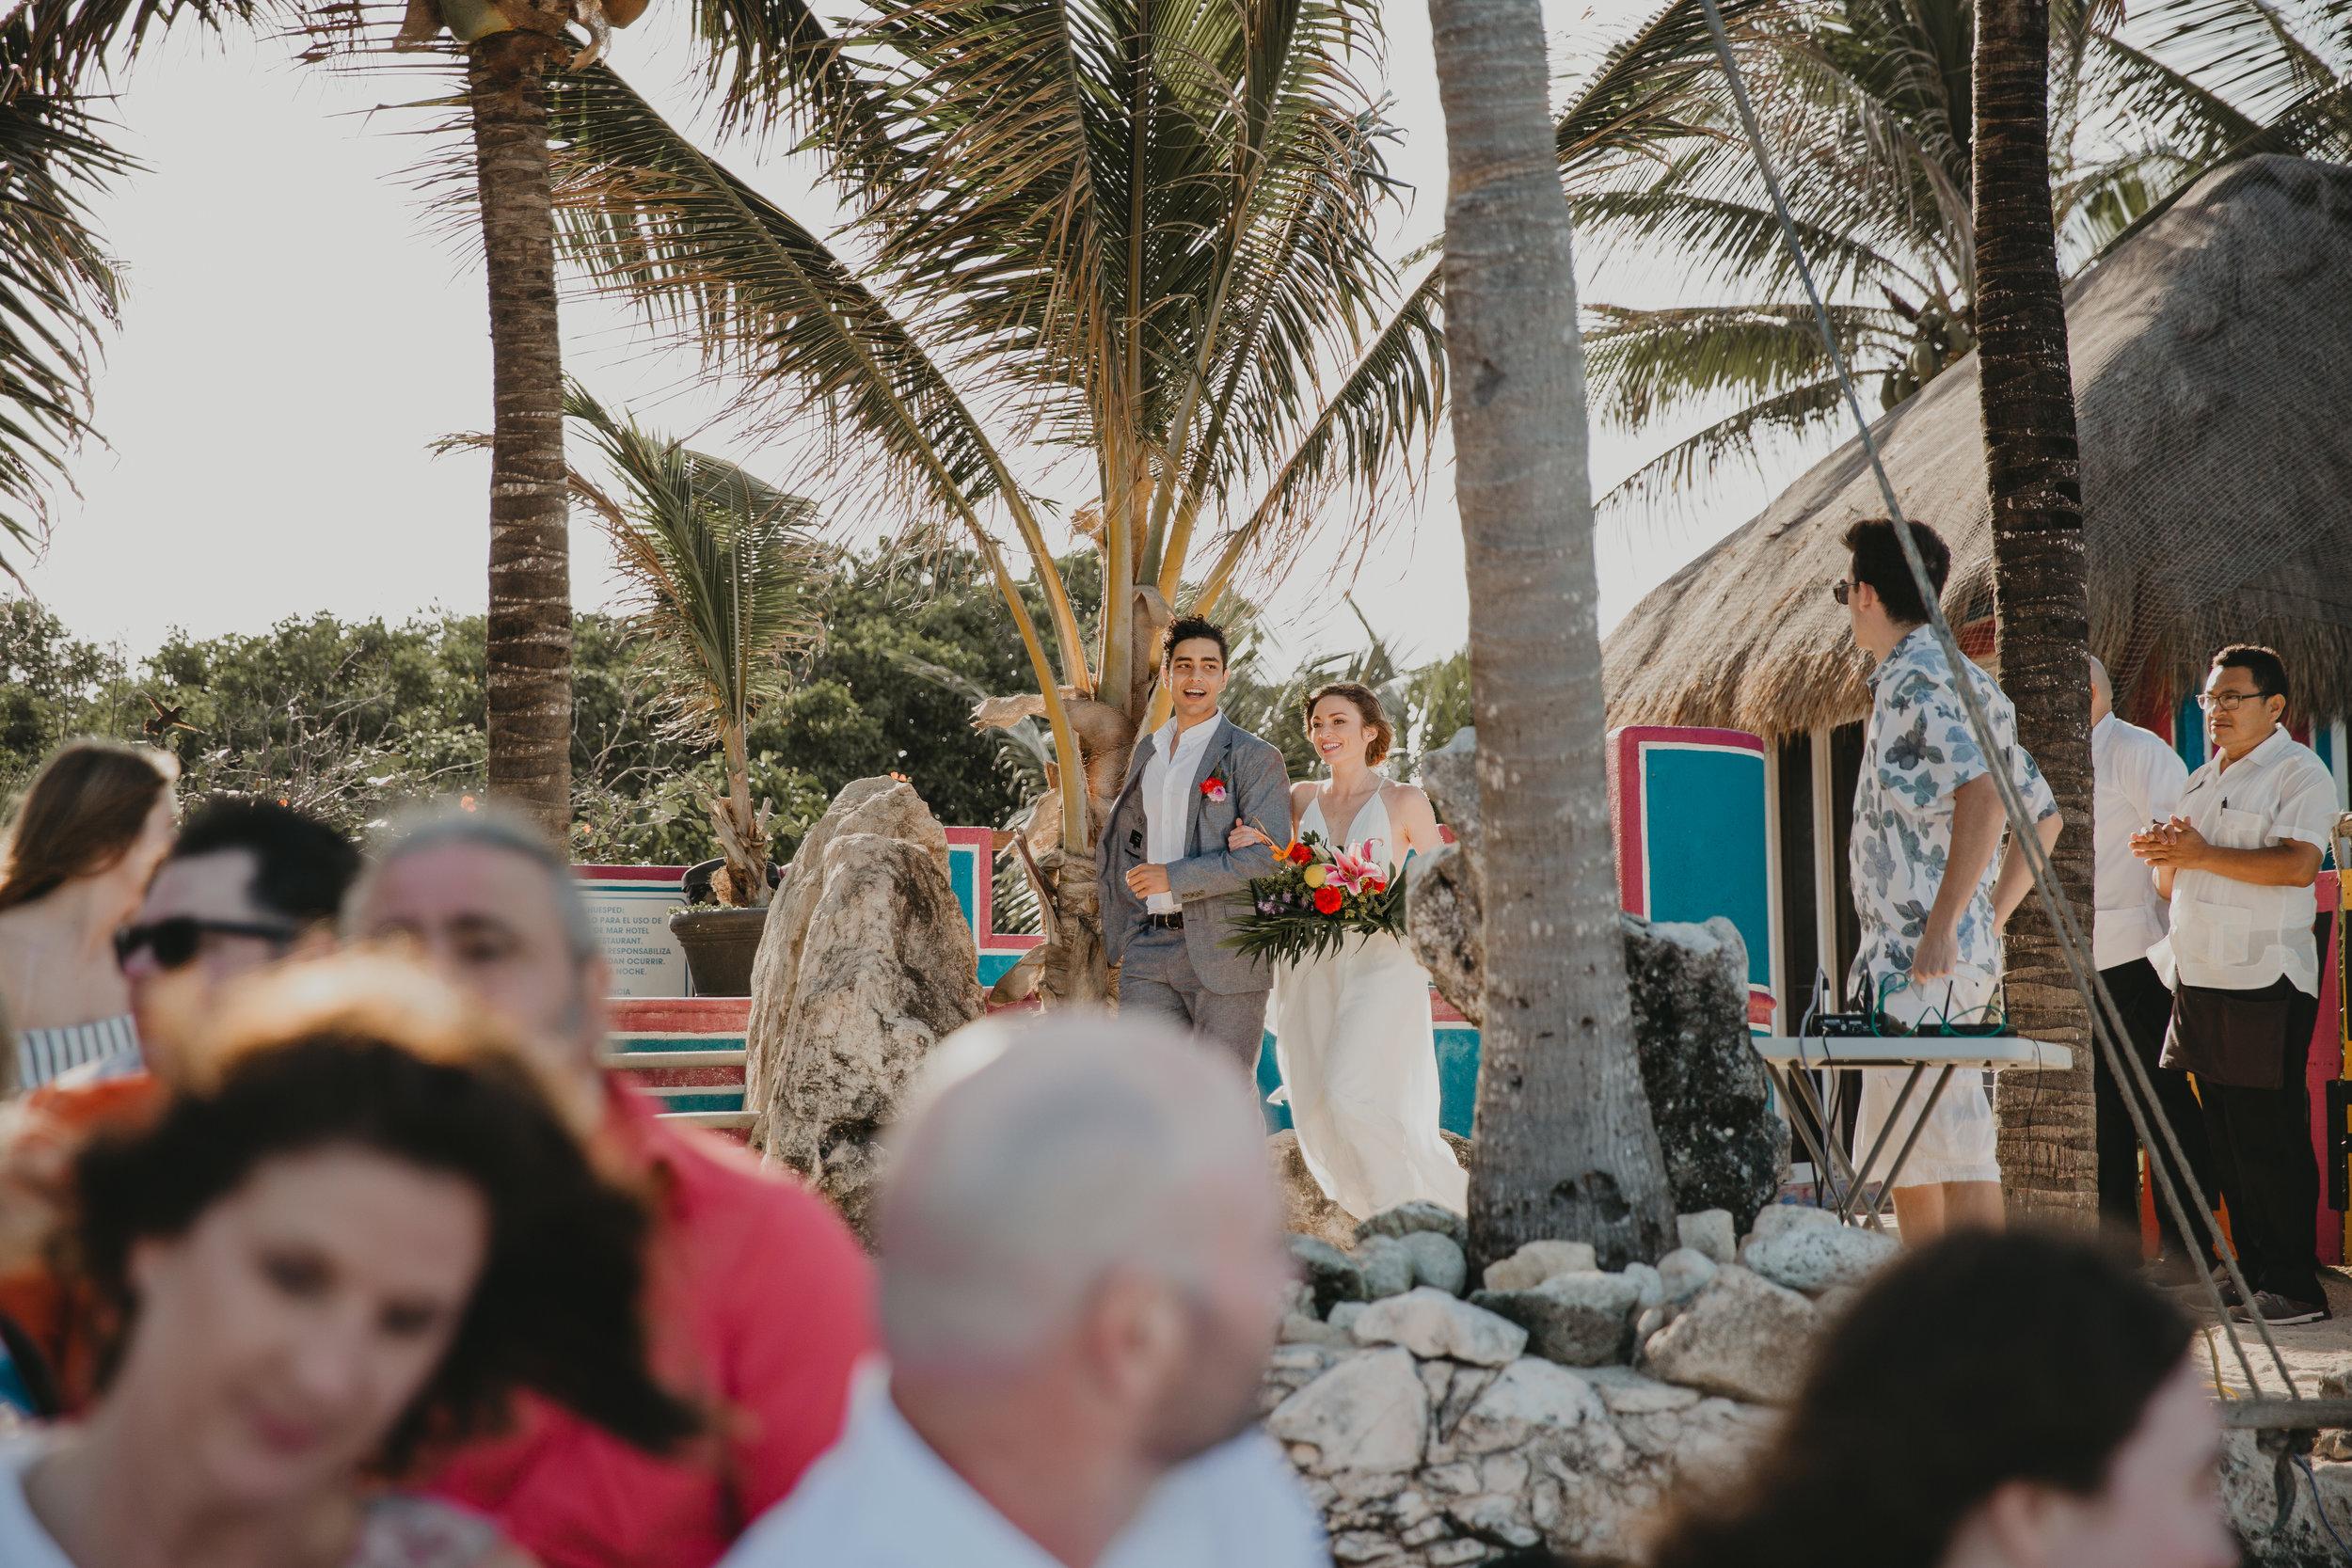 Nicole-Daacke-Photography-beachfront-akumal-destionation-wedding-tulum-mexico-elopement-photographer-destination-wedding-inspiration-sunset-champagne-pop-boho-bride-ocean-tropical-bohemian-tulum-wedding-photos-153.jpg